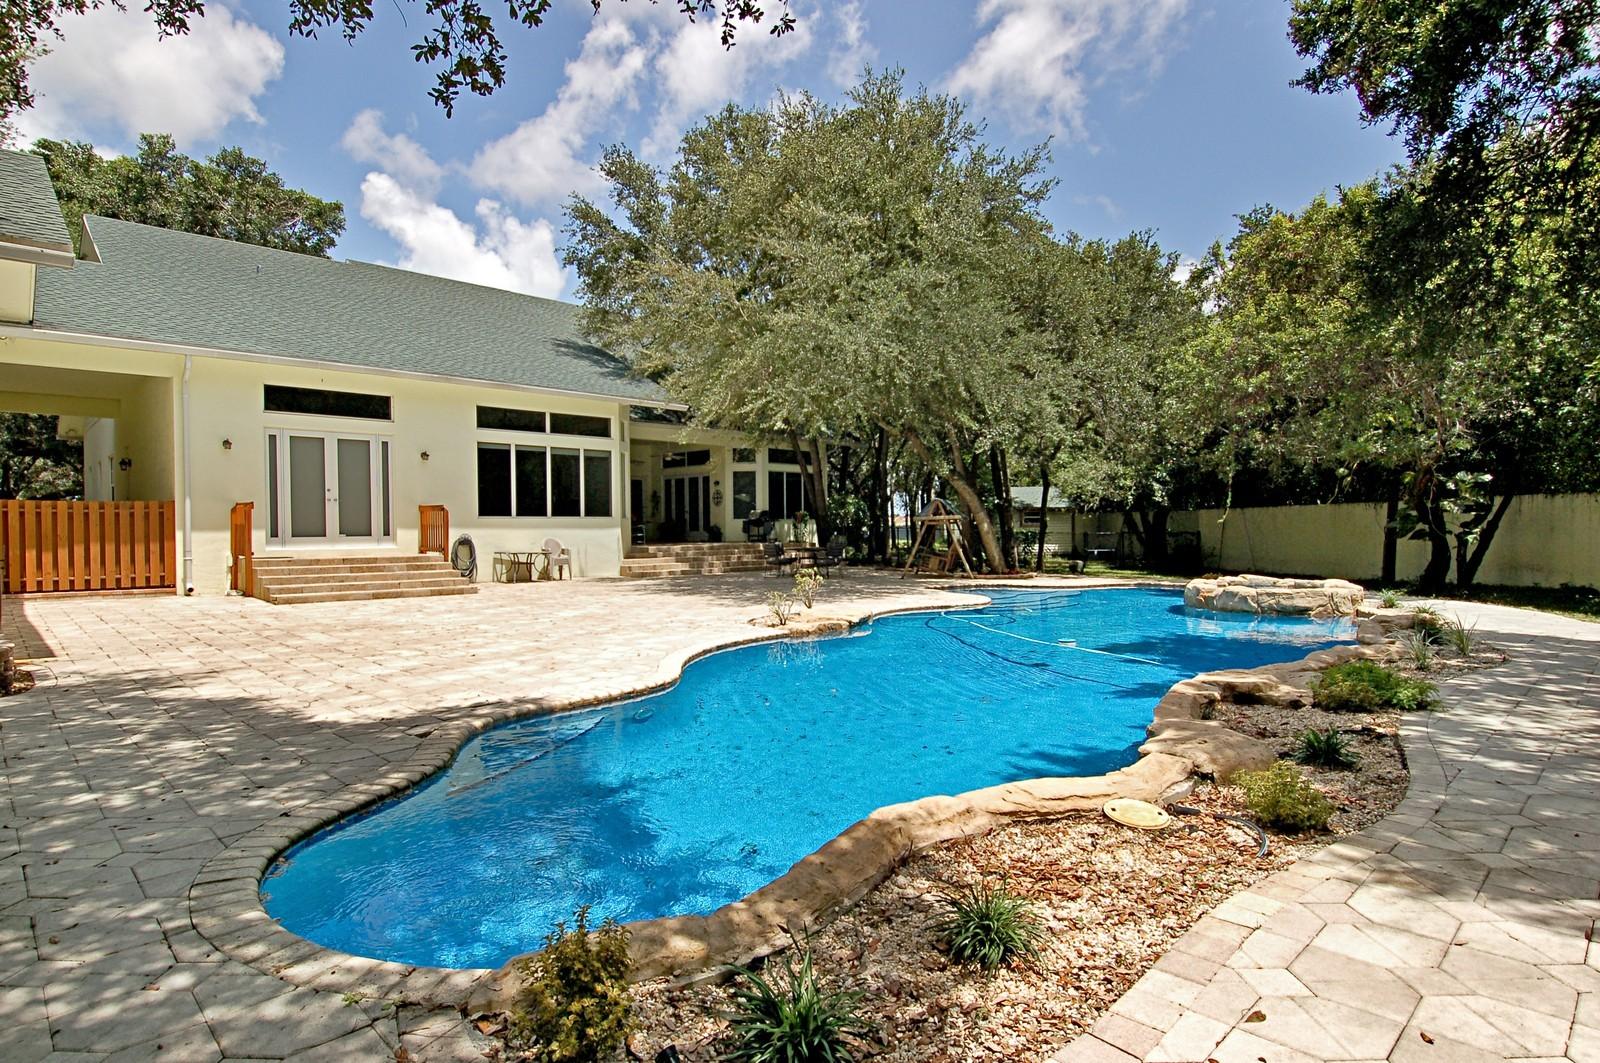 Real Estate Photography - 5400 Woodlanden Ln, Ft Lauderdale, FL, 33021 - Pool